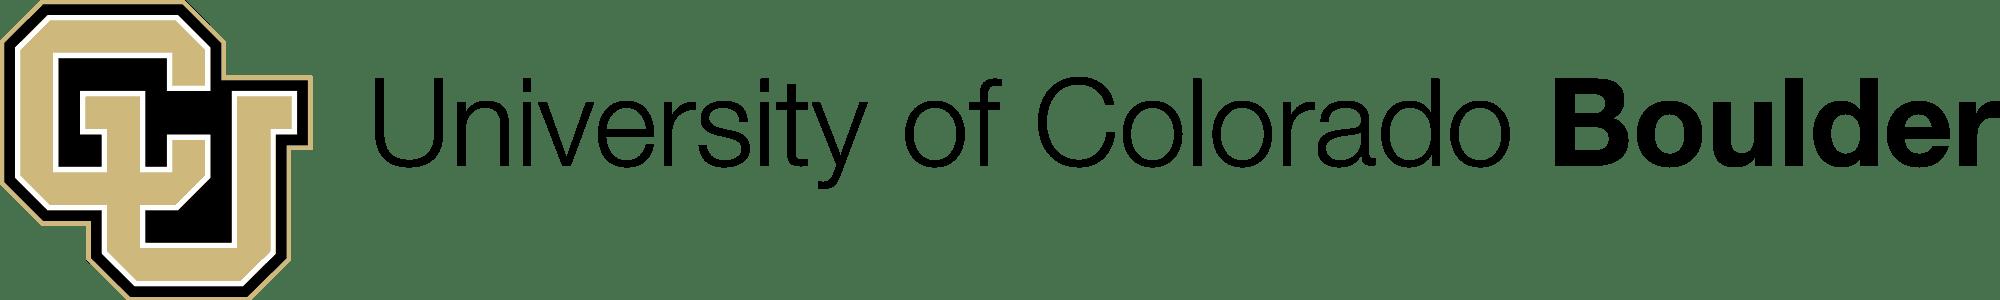 graduate distance education university of colorado boulder logo 130281